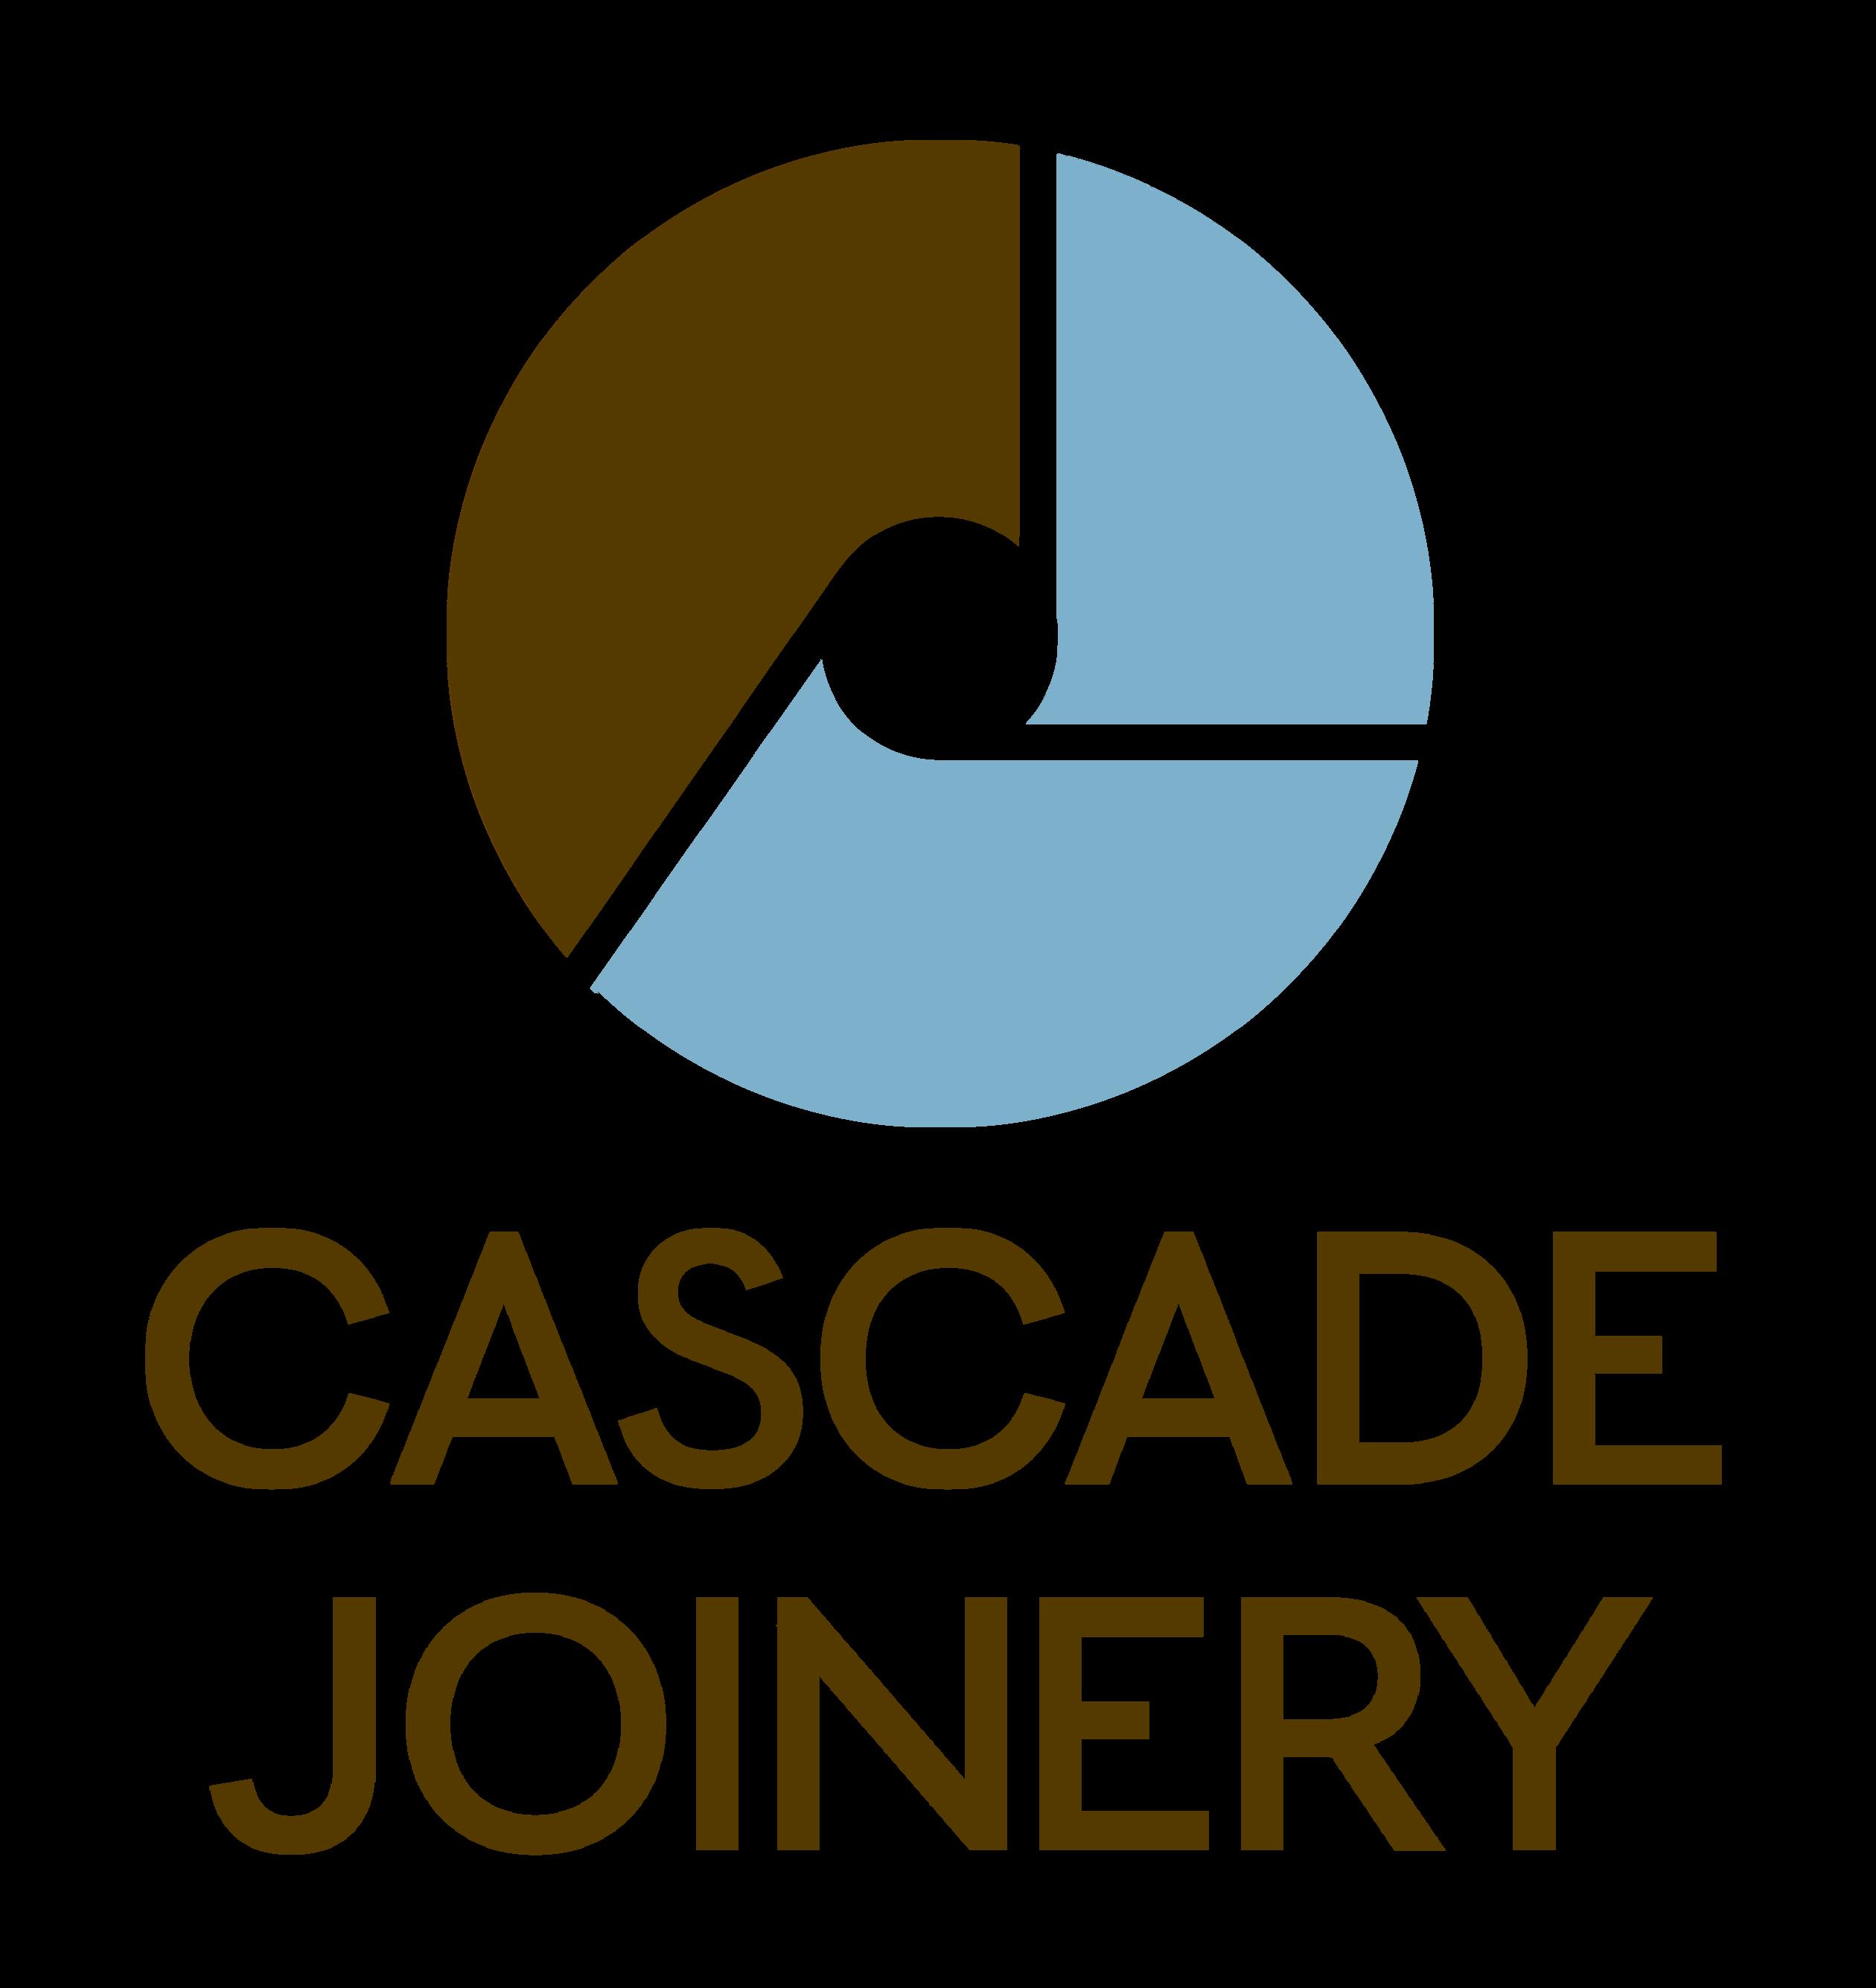 Cascade Joinery